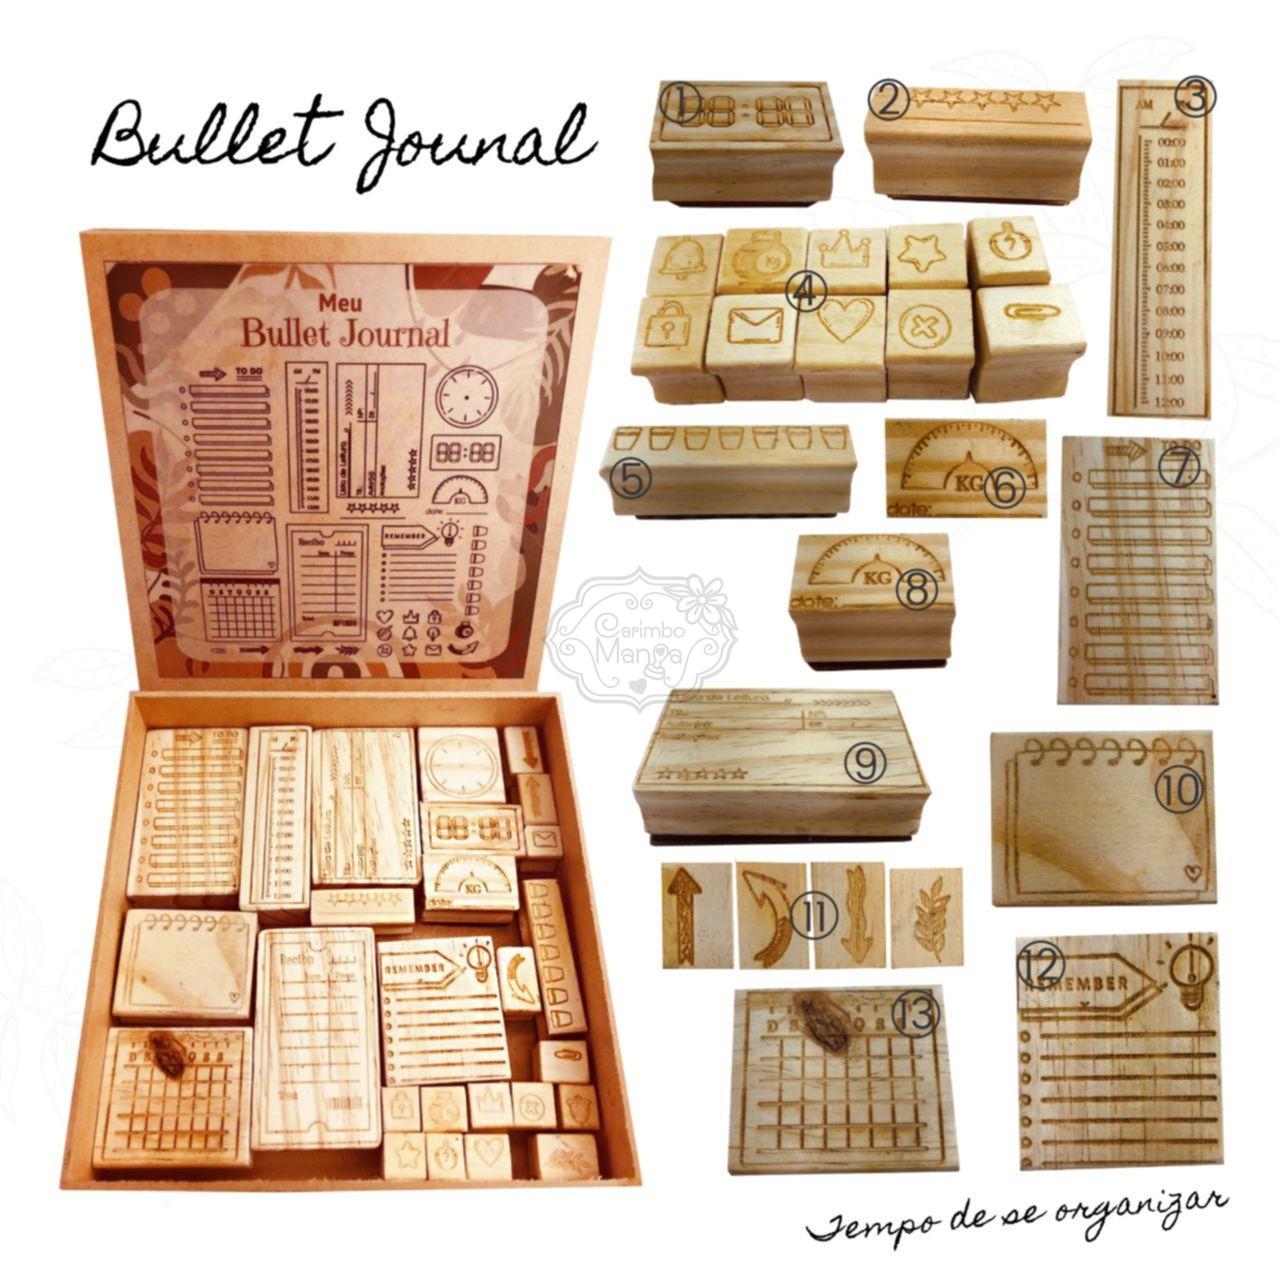 carimbo Bullet Journal